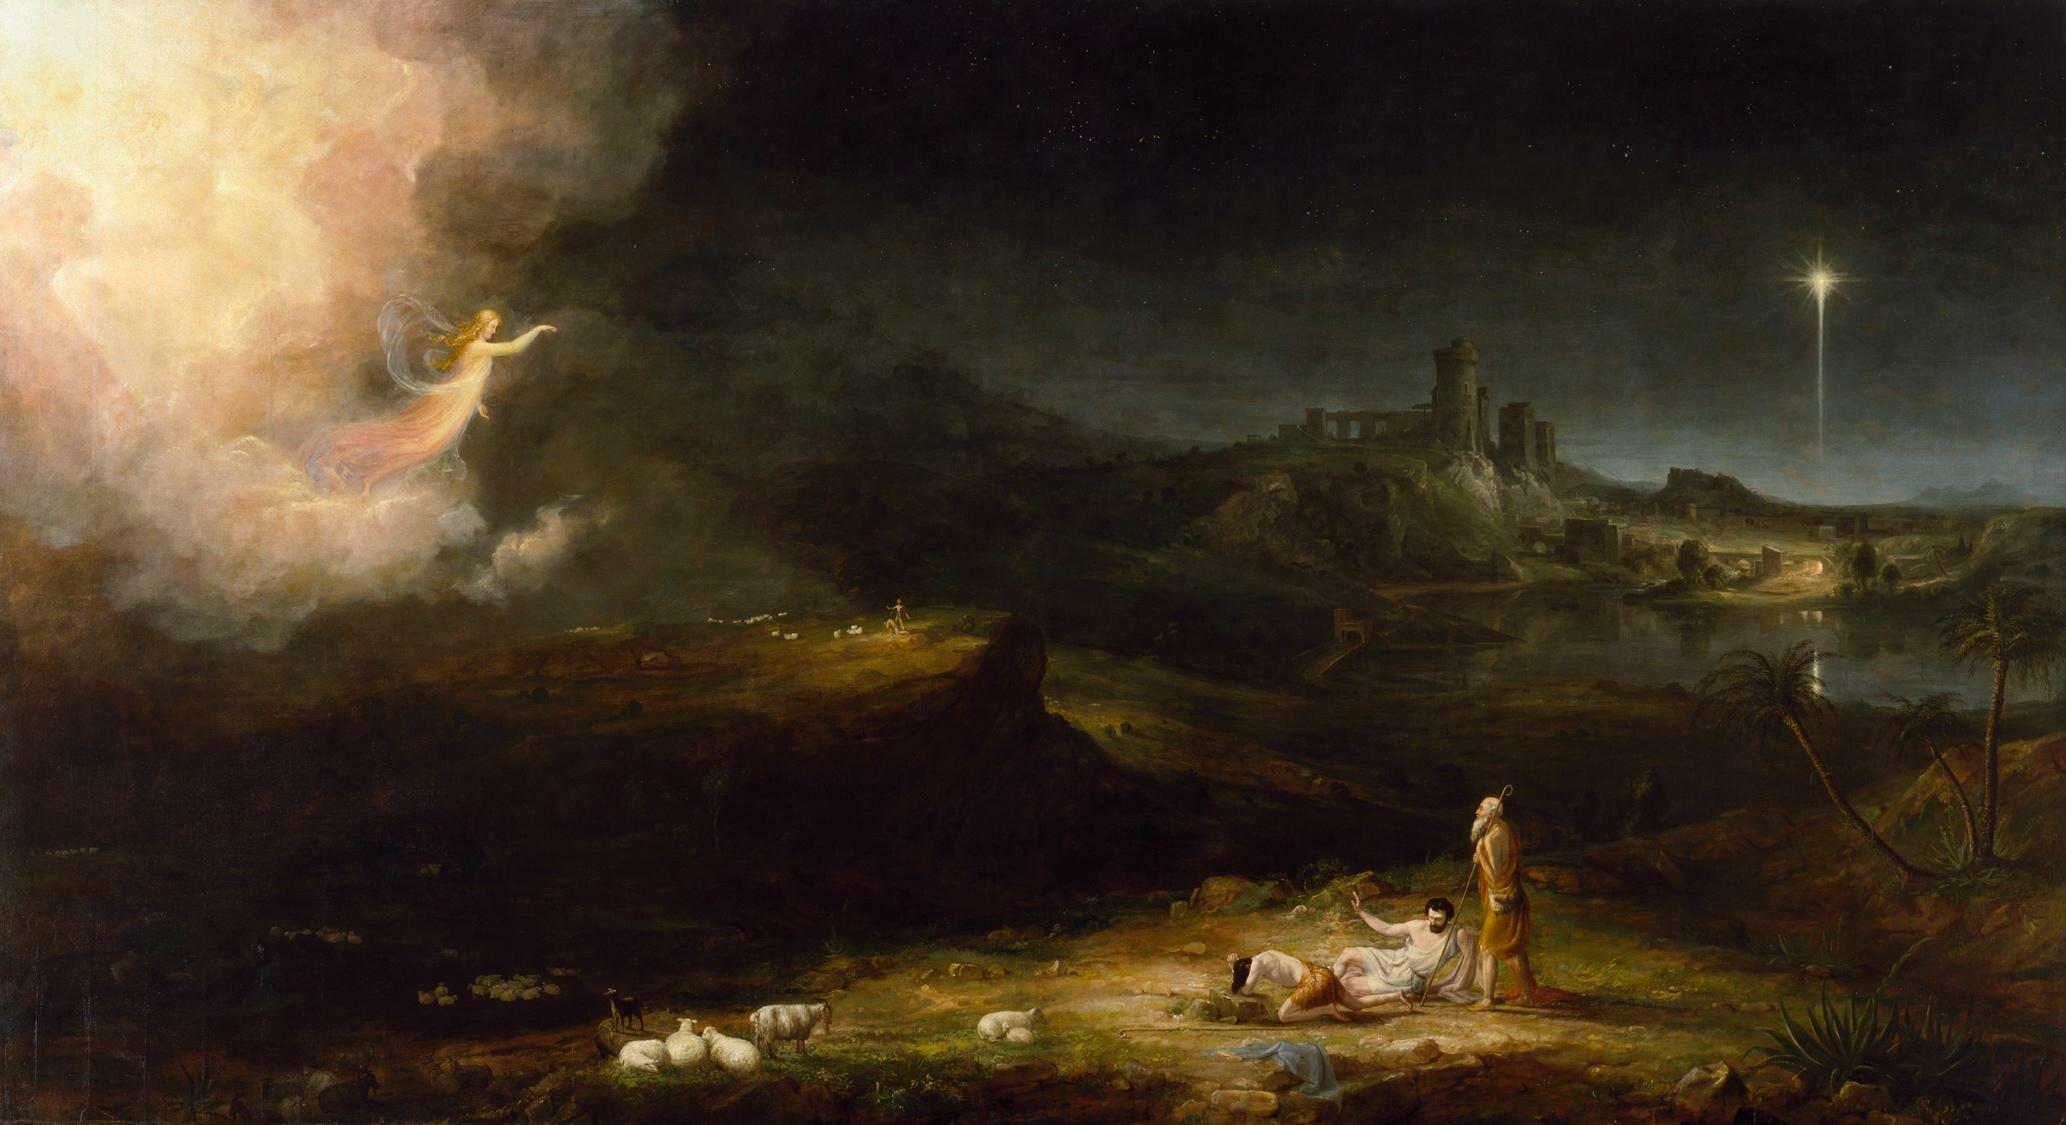 Christmas: The Humility of God